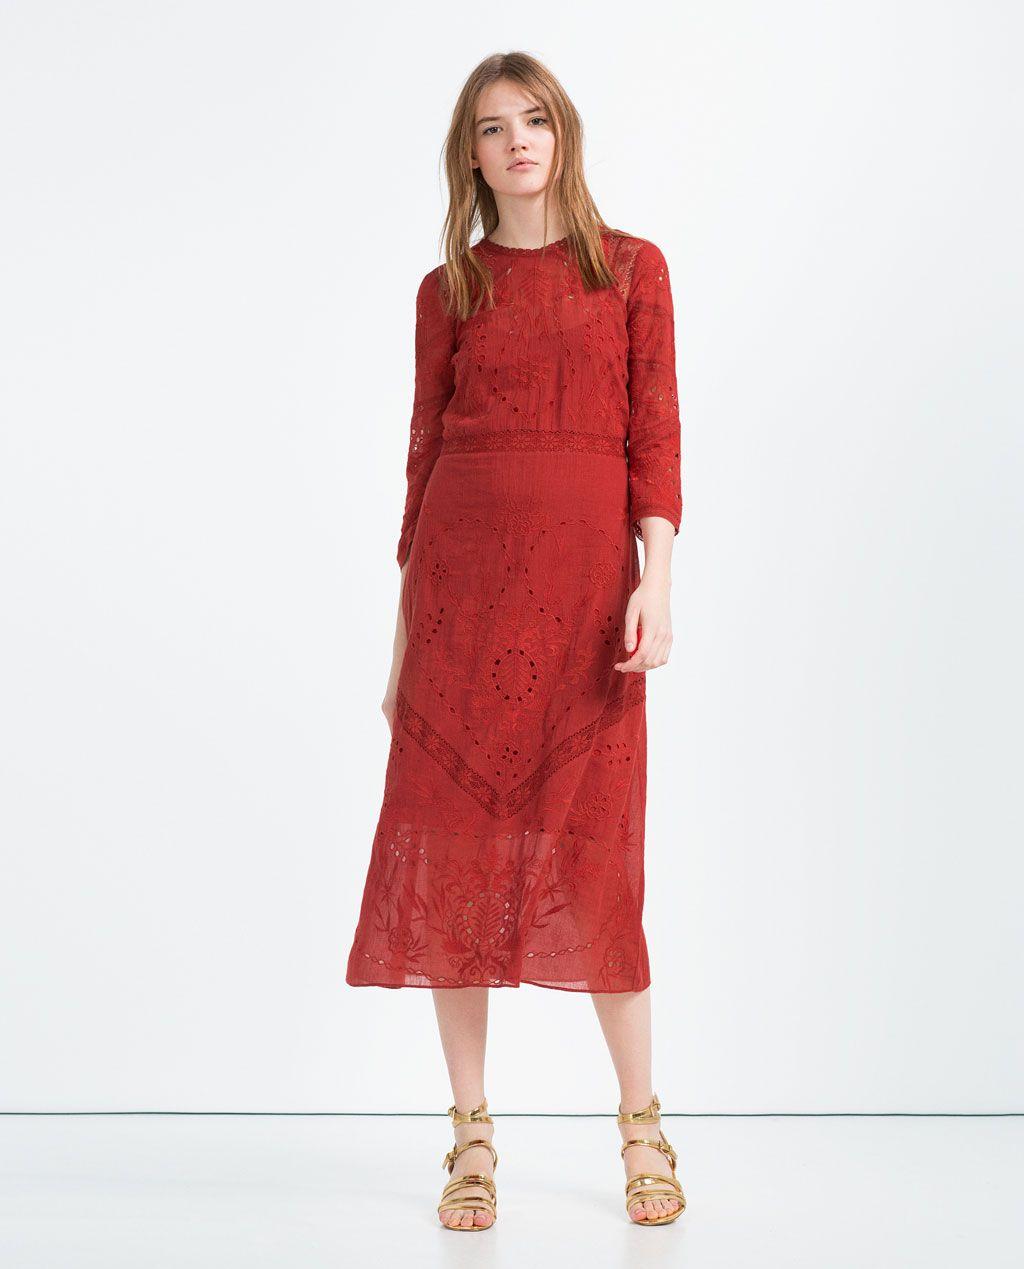 Embroidered dress dresses trf zara indonesia dresses pinterest embroidered dress dresses trf zara indonesia stopboris Images